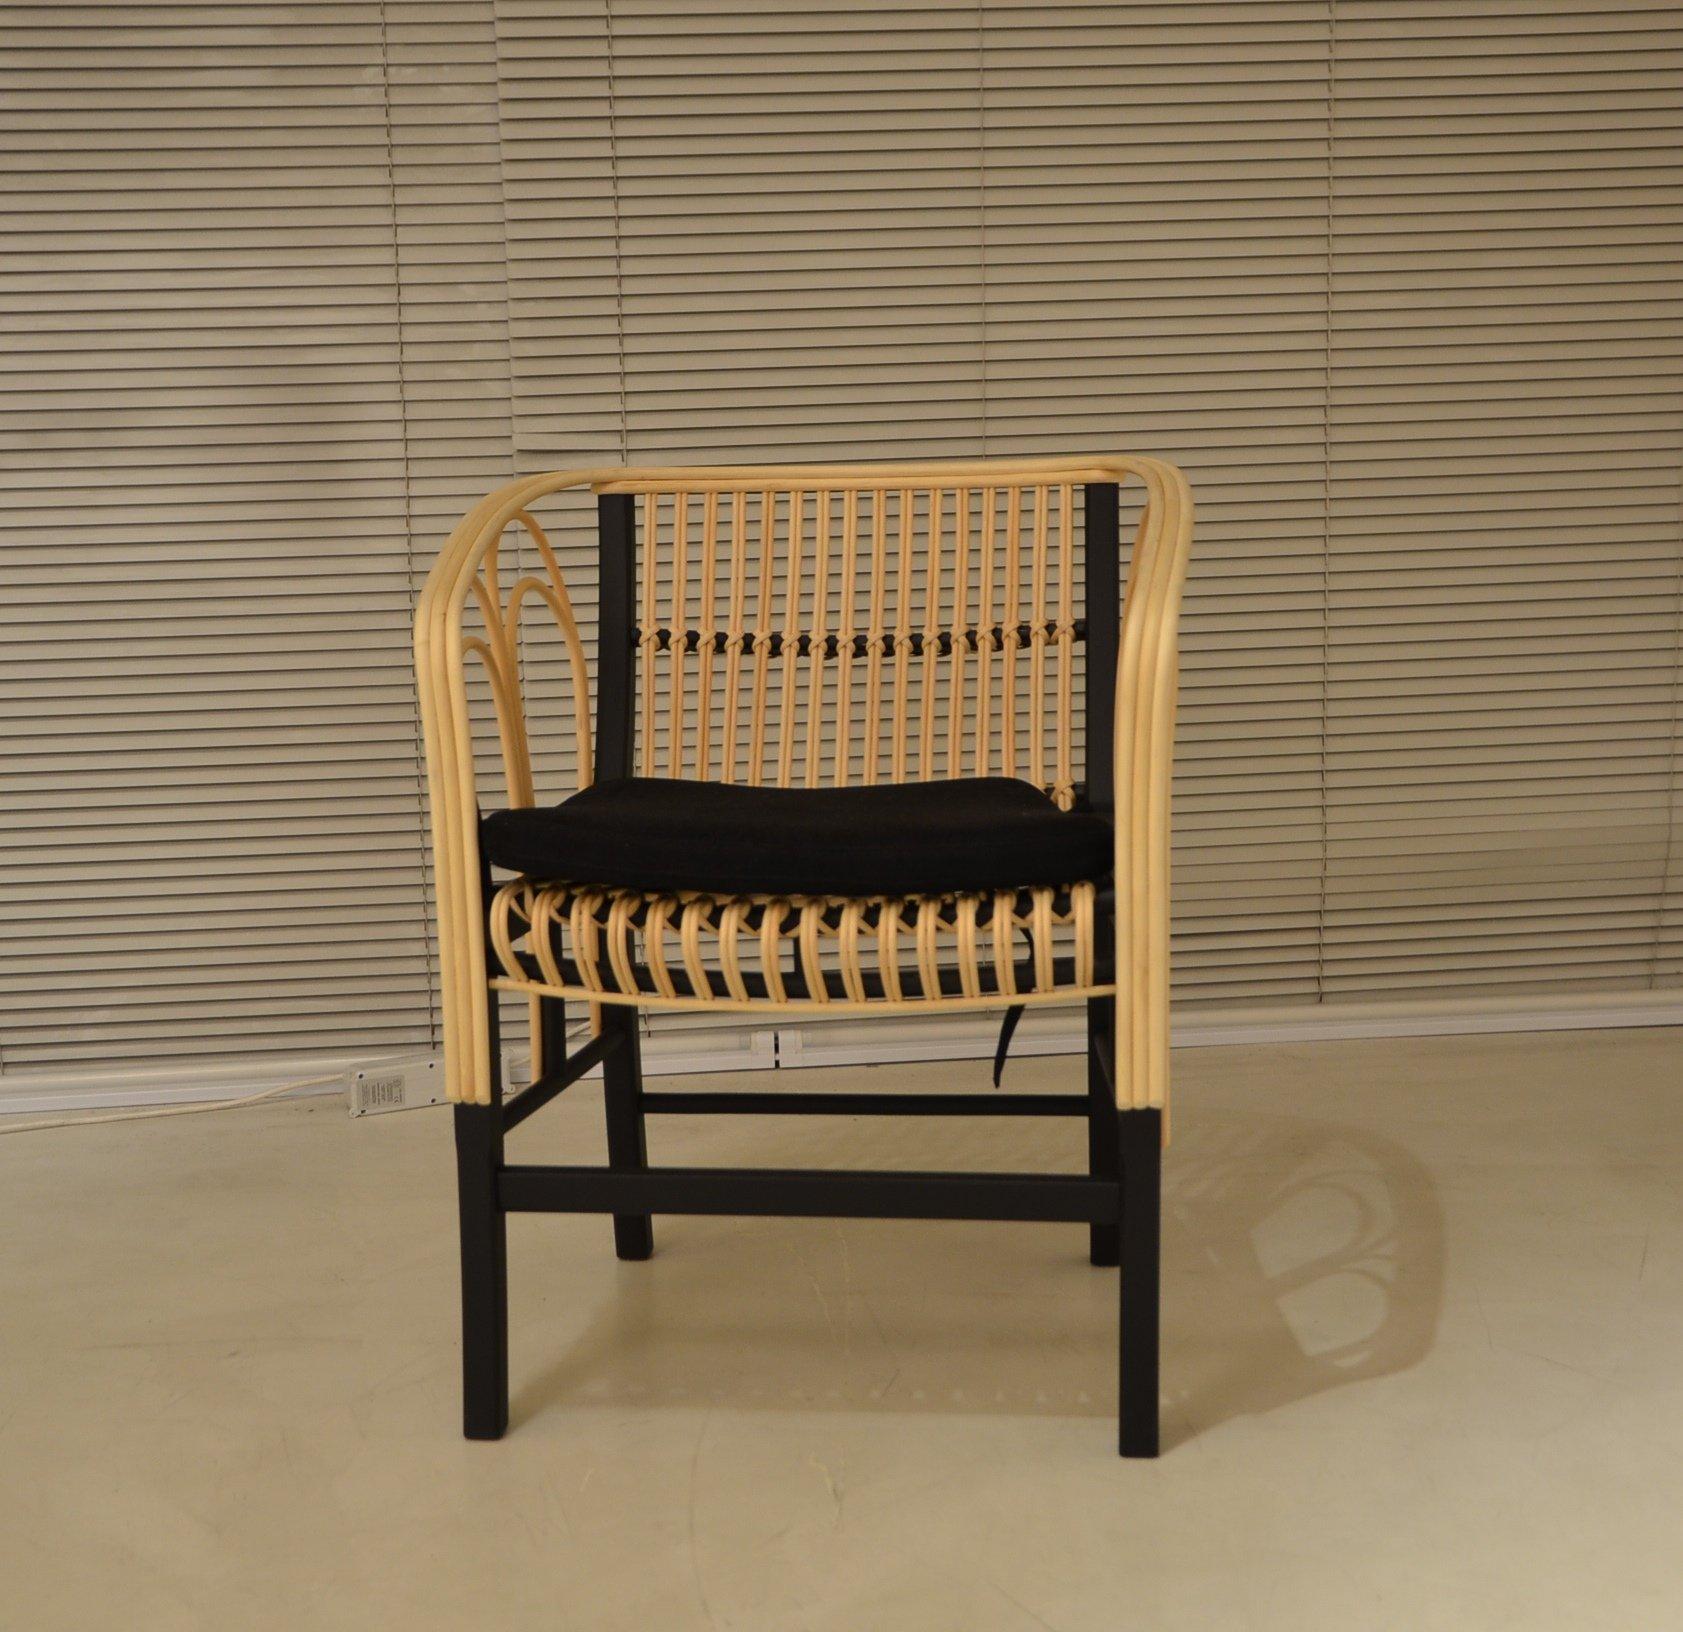 URAGANO Vico Magistretti De Padova 오리지널 의자 디자인 이태리에서 만듦